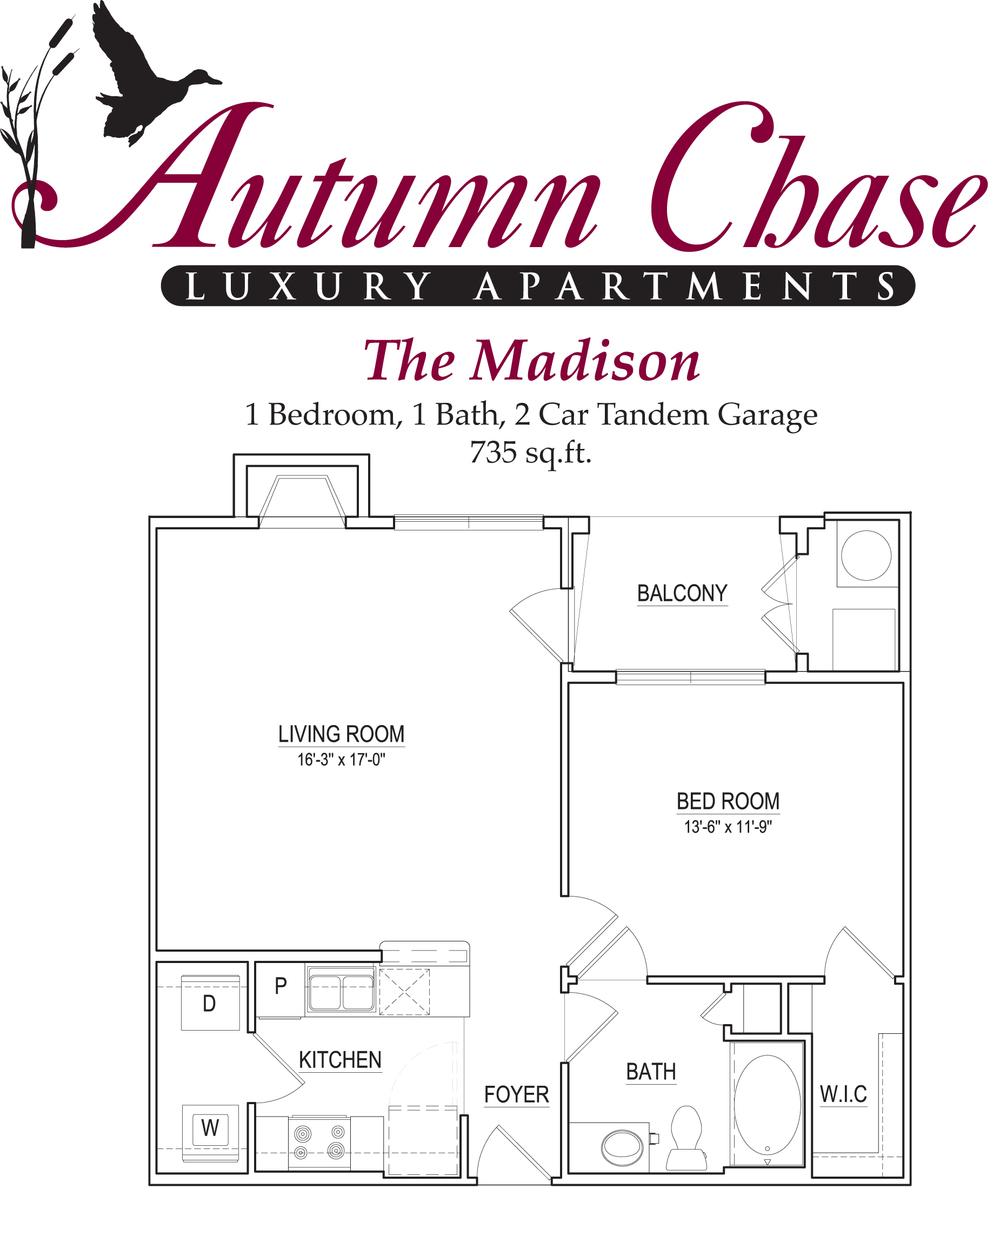 The Madison.jpg